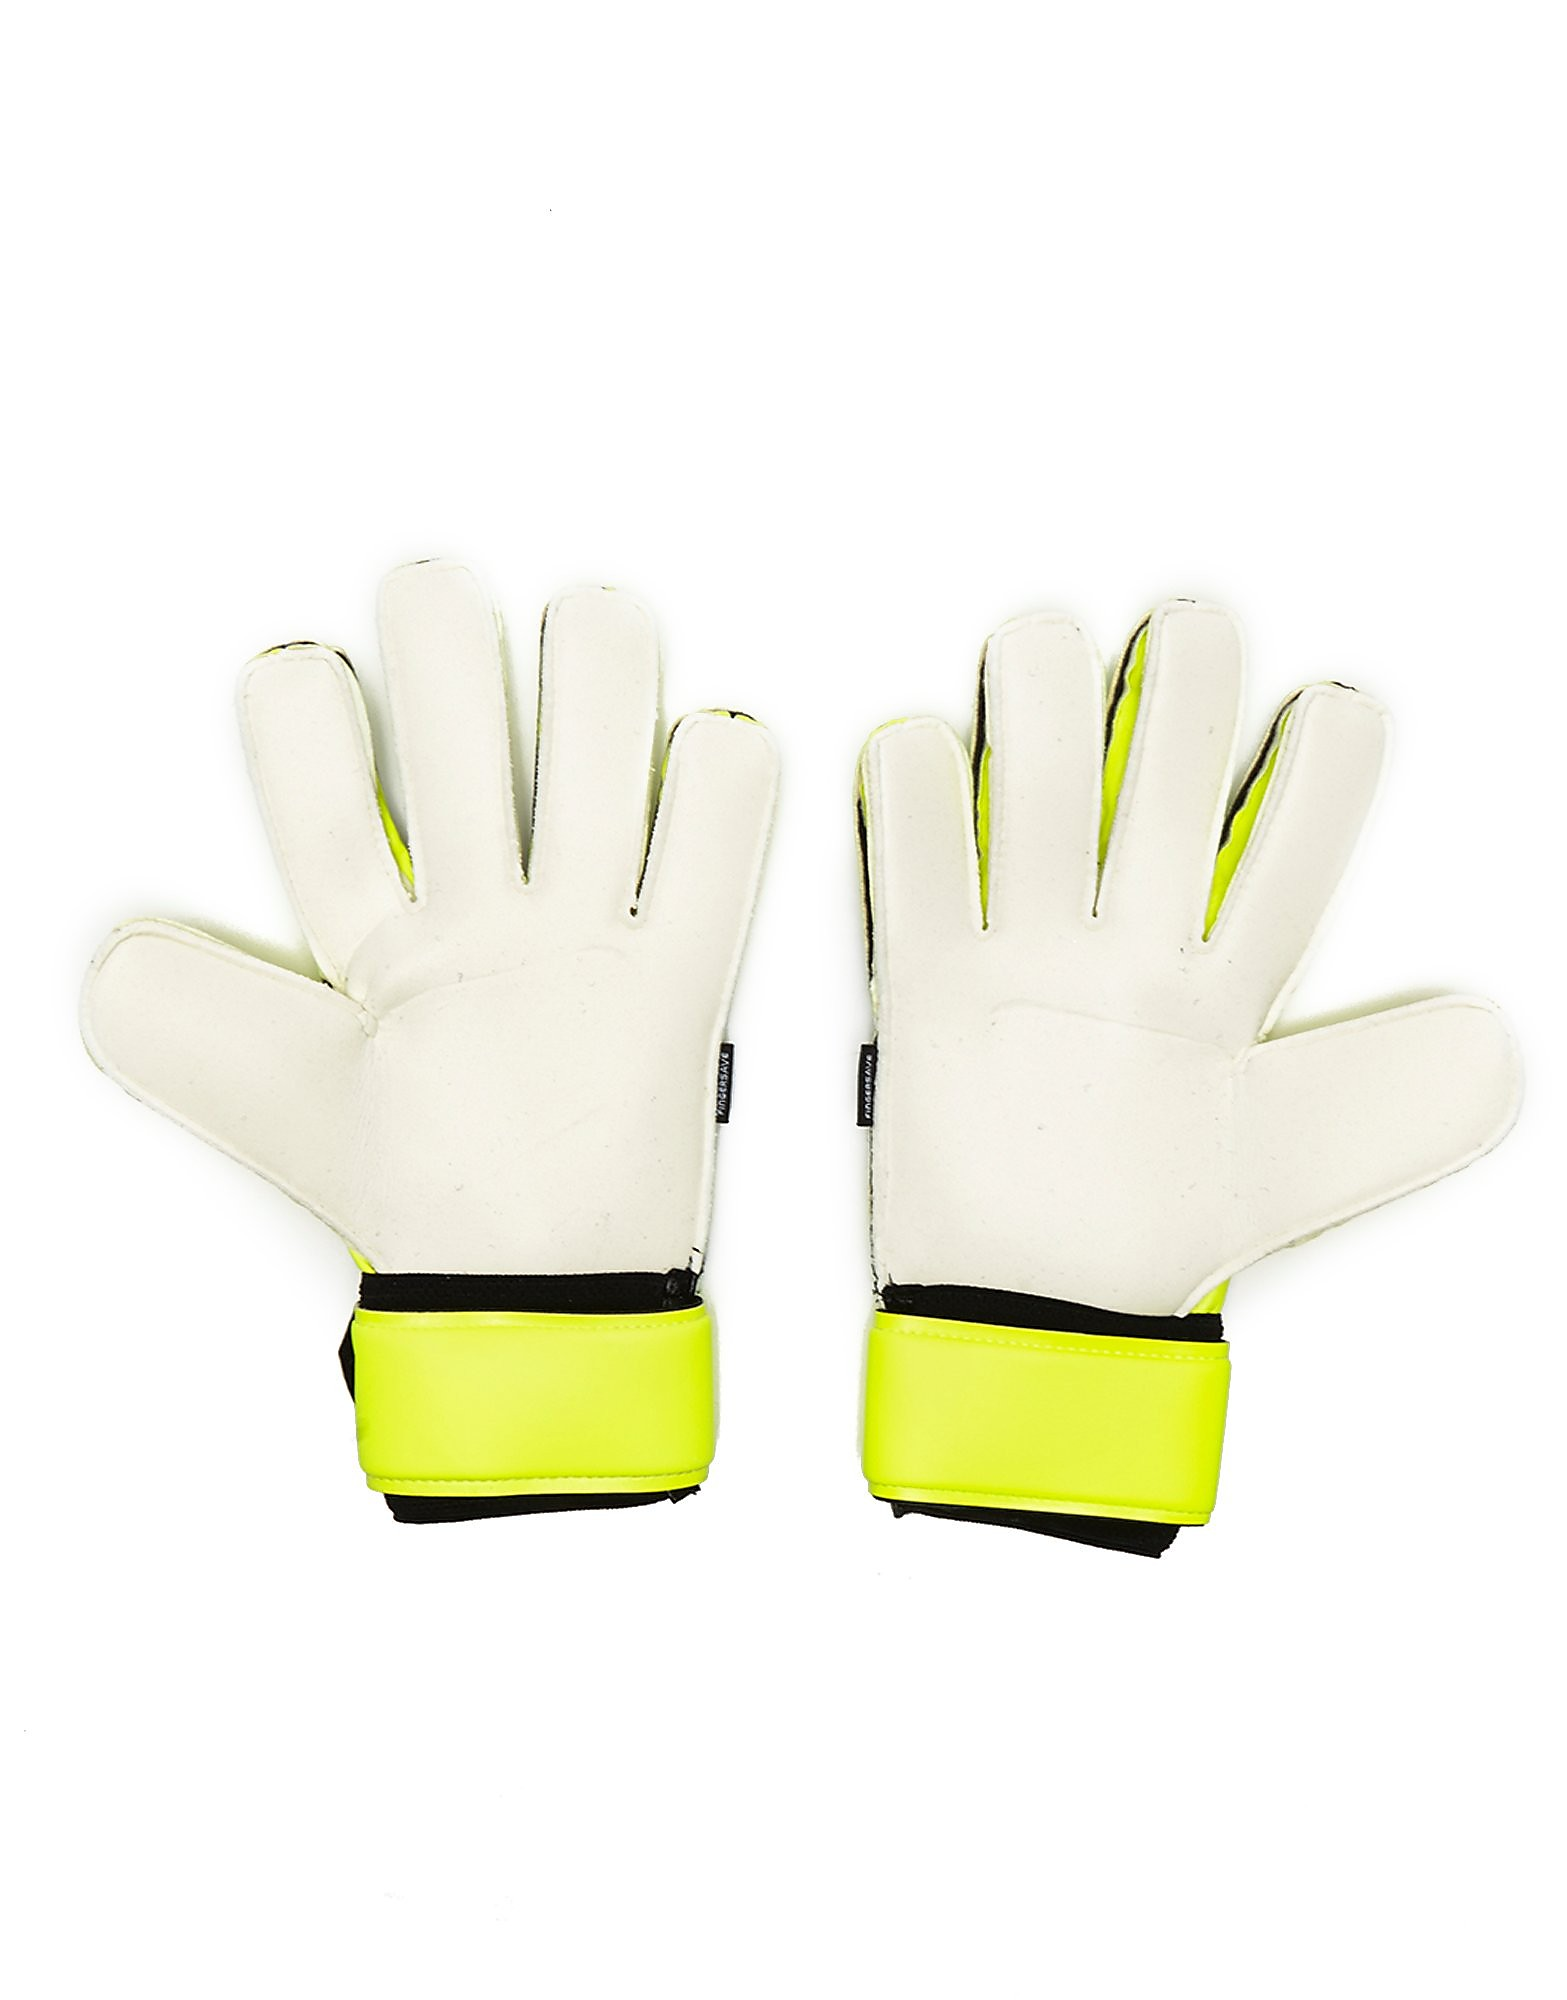 adidas Ace Fingersave Goalkeeping Gloves